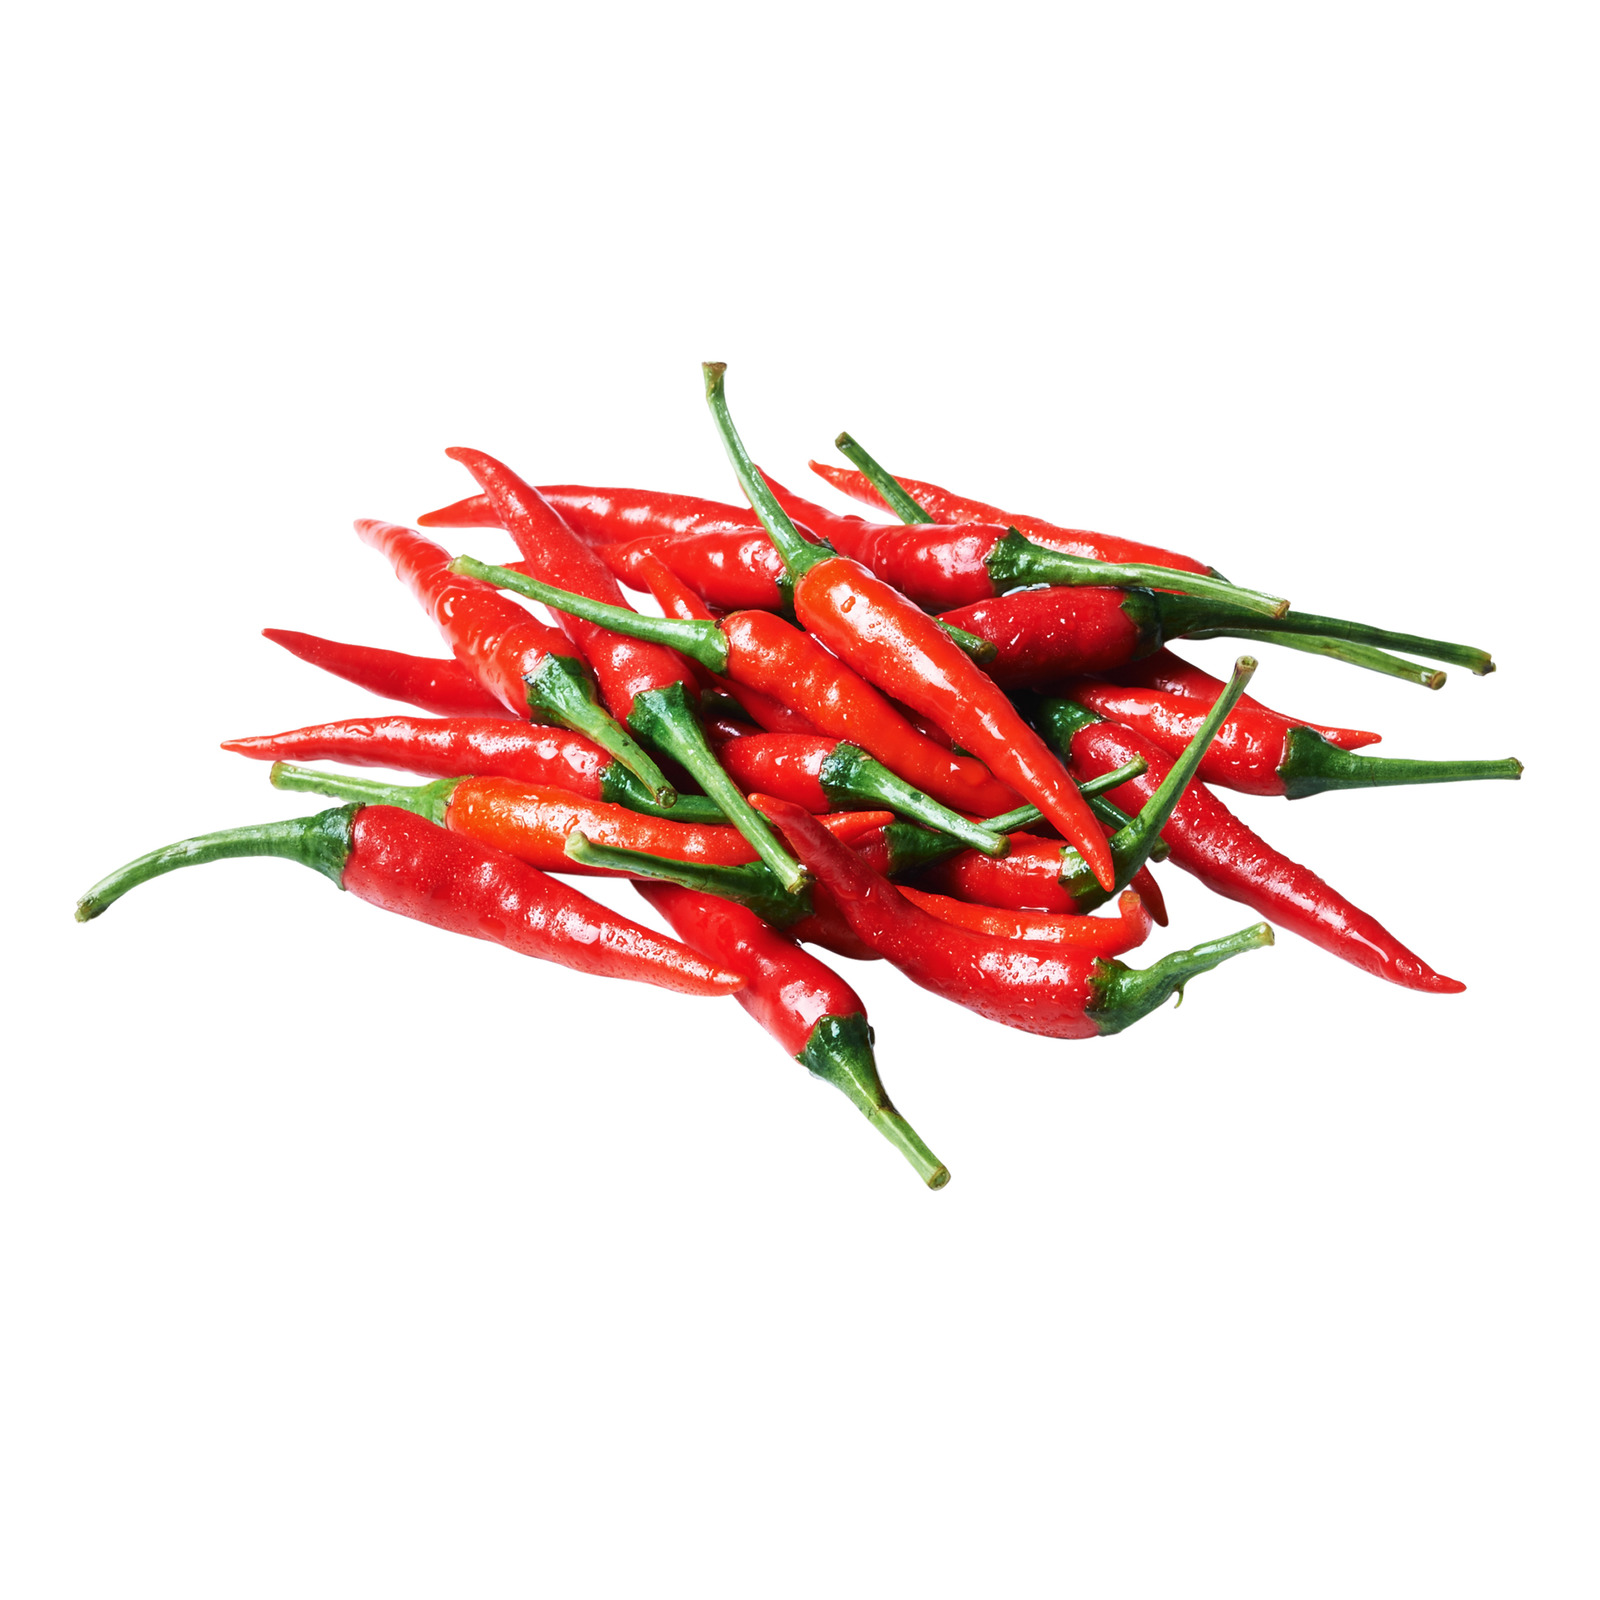 Pasar Red Chili Padi